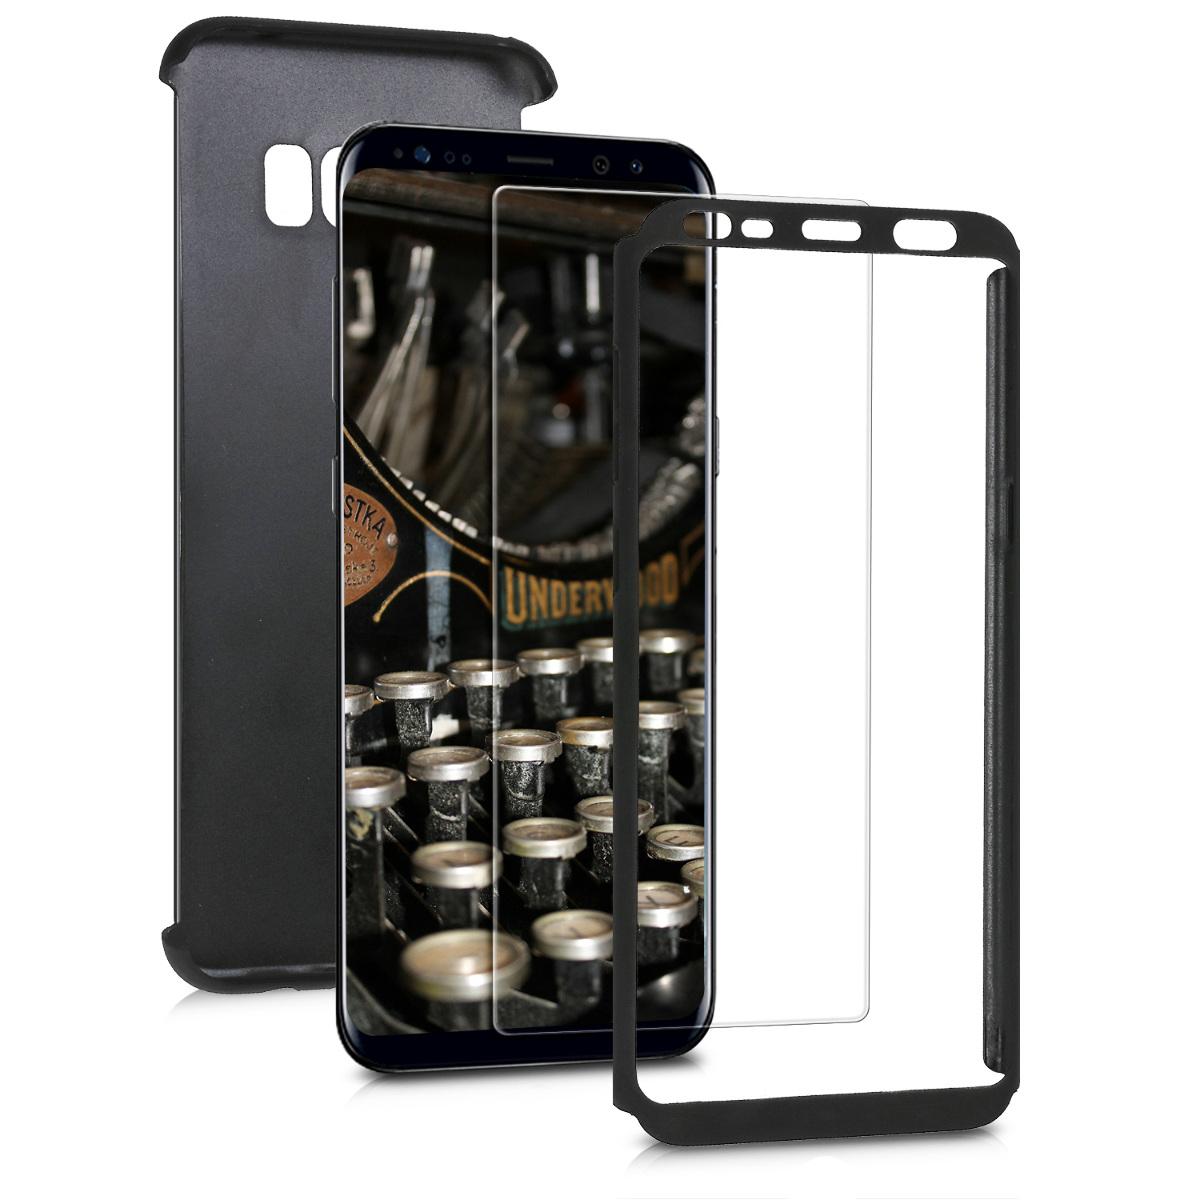 KW Θήκη Full Body για Samsung Galaxy S8 Plus & Screen Protector - Metallic Black (45620.68)